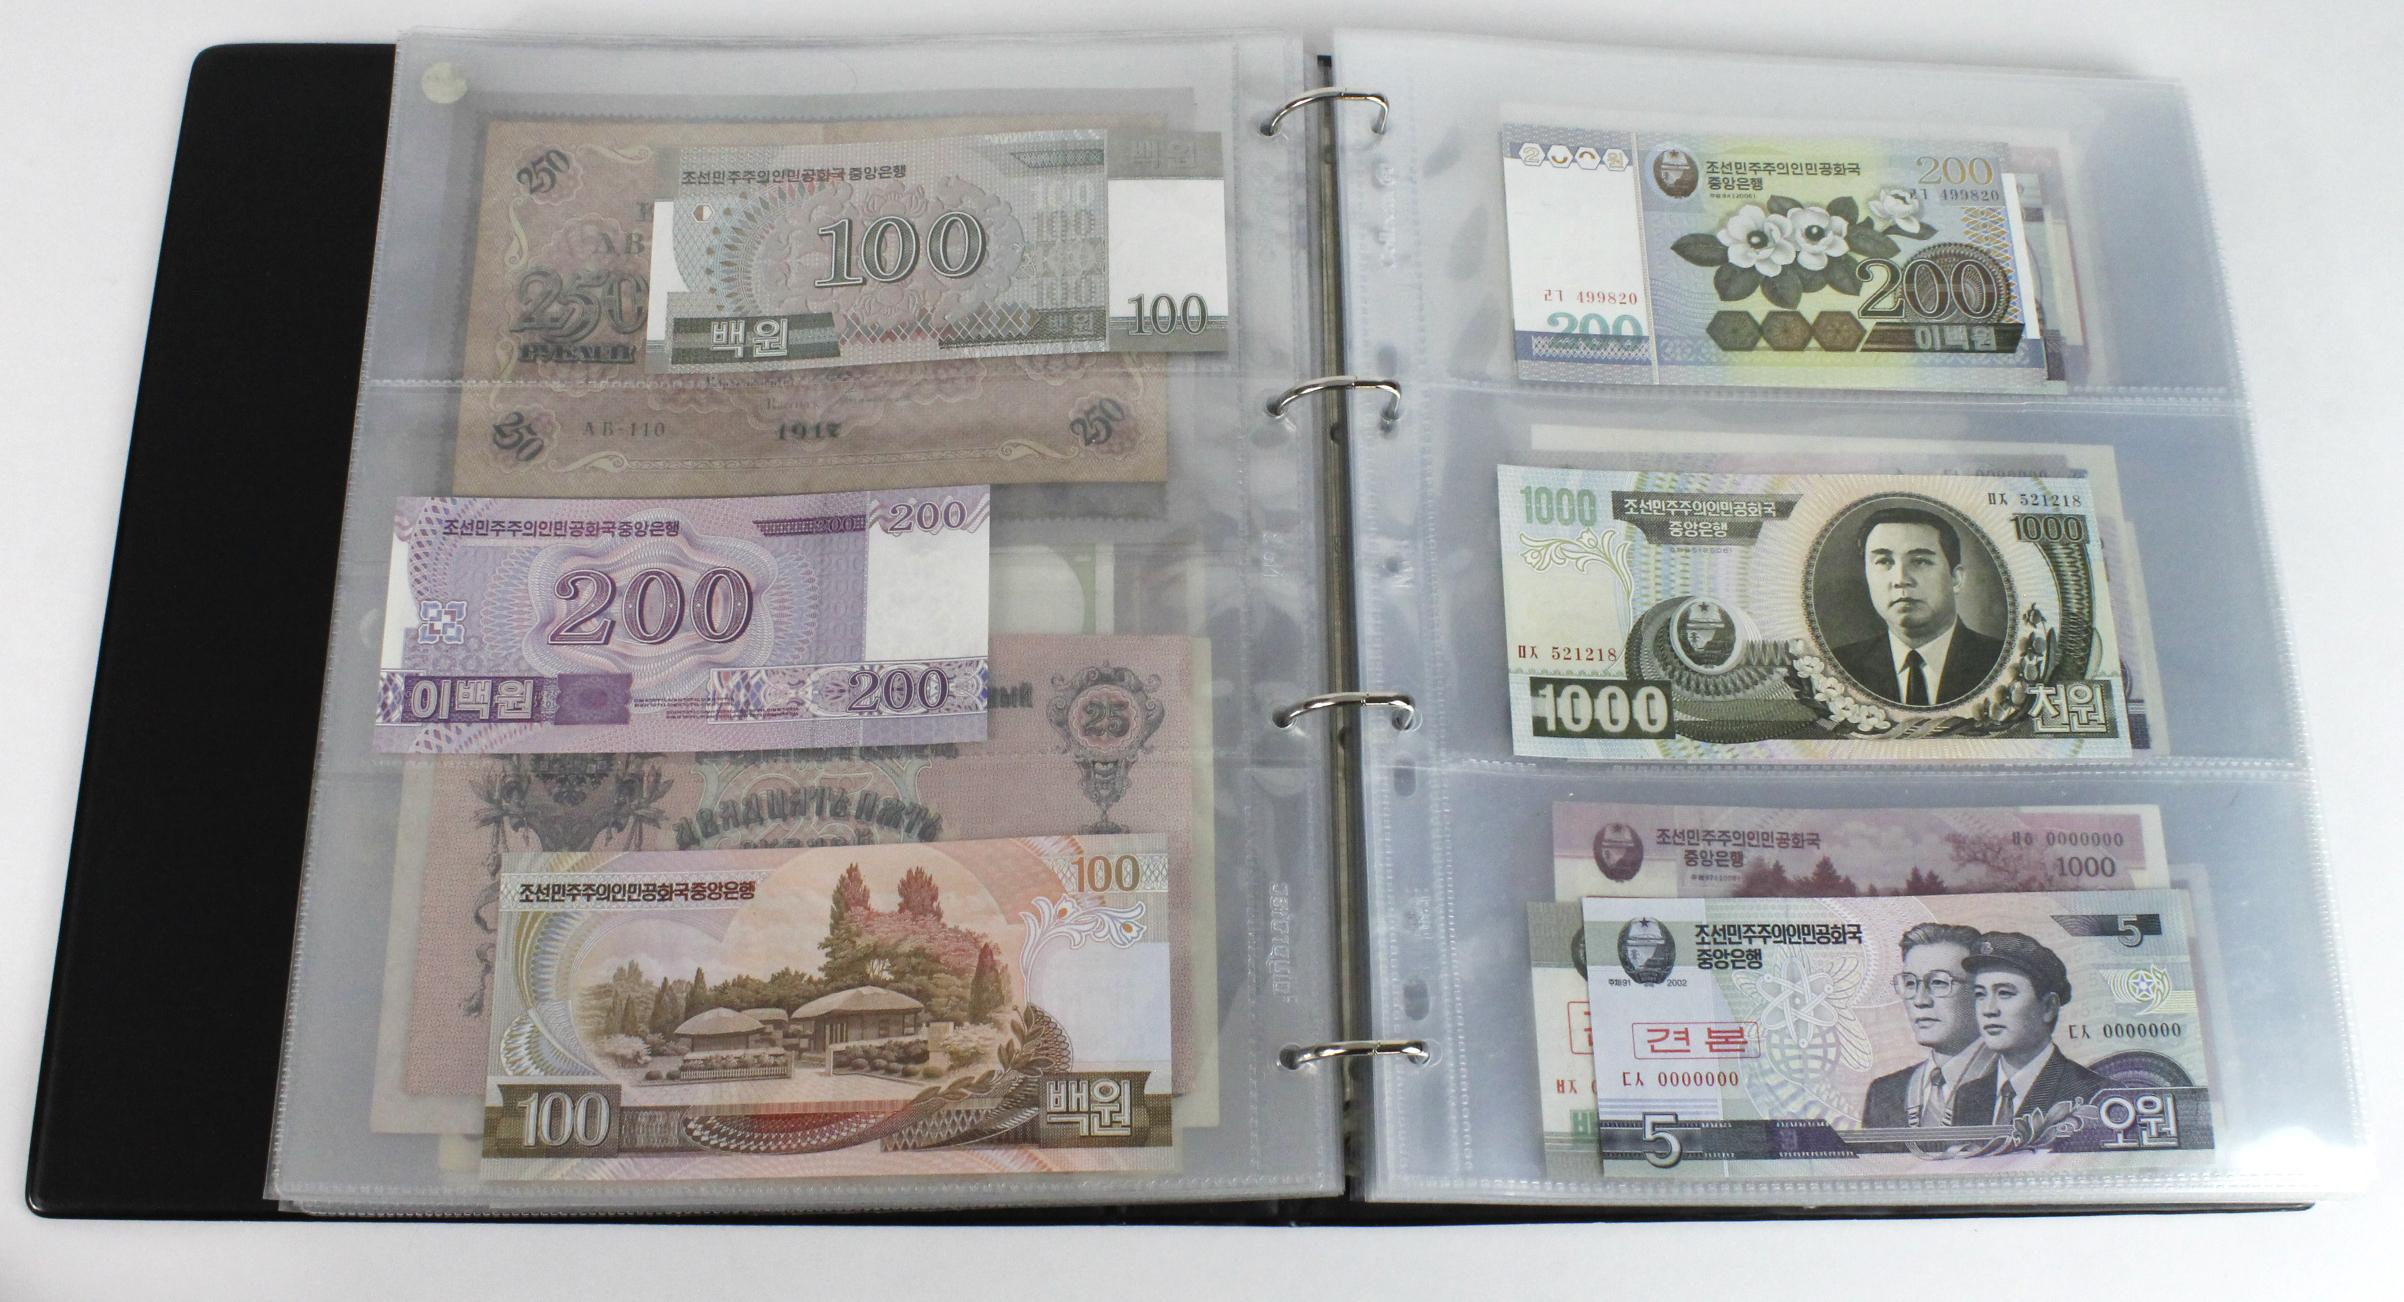 World (163), in banknote album including Bahamas, Spain, Sweden, Netherlands, Algeria, Macau, - Image 24 of 57